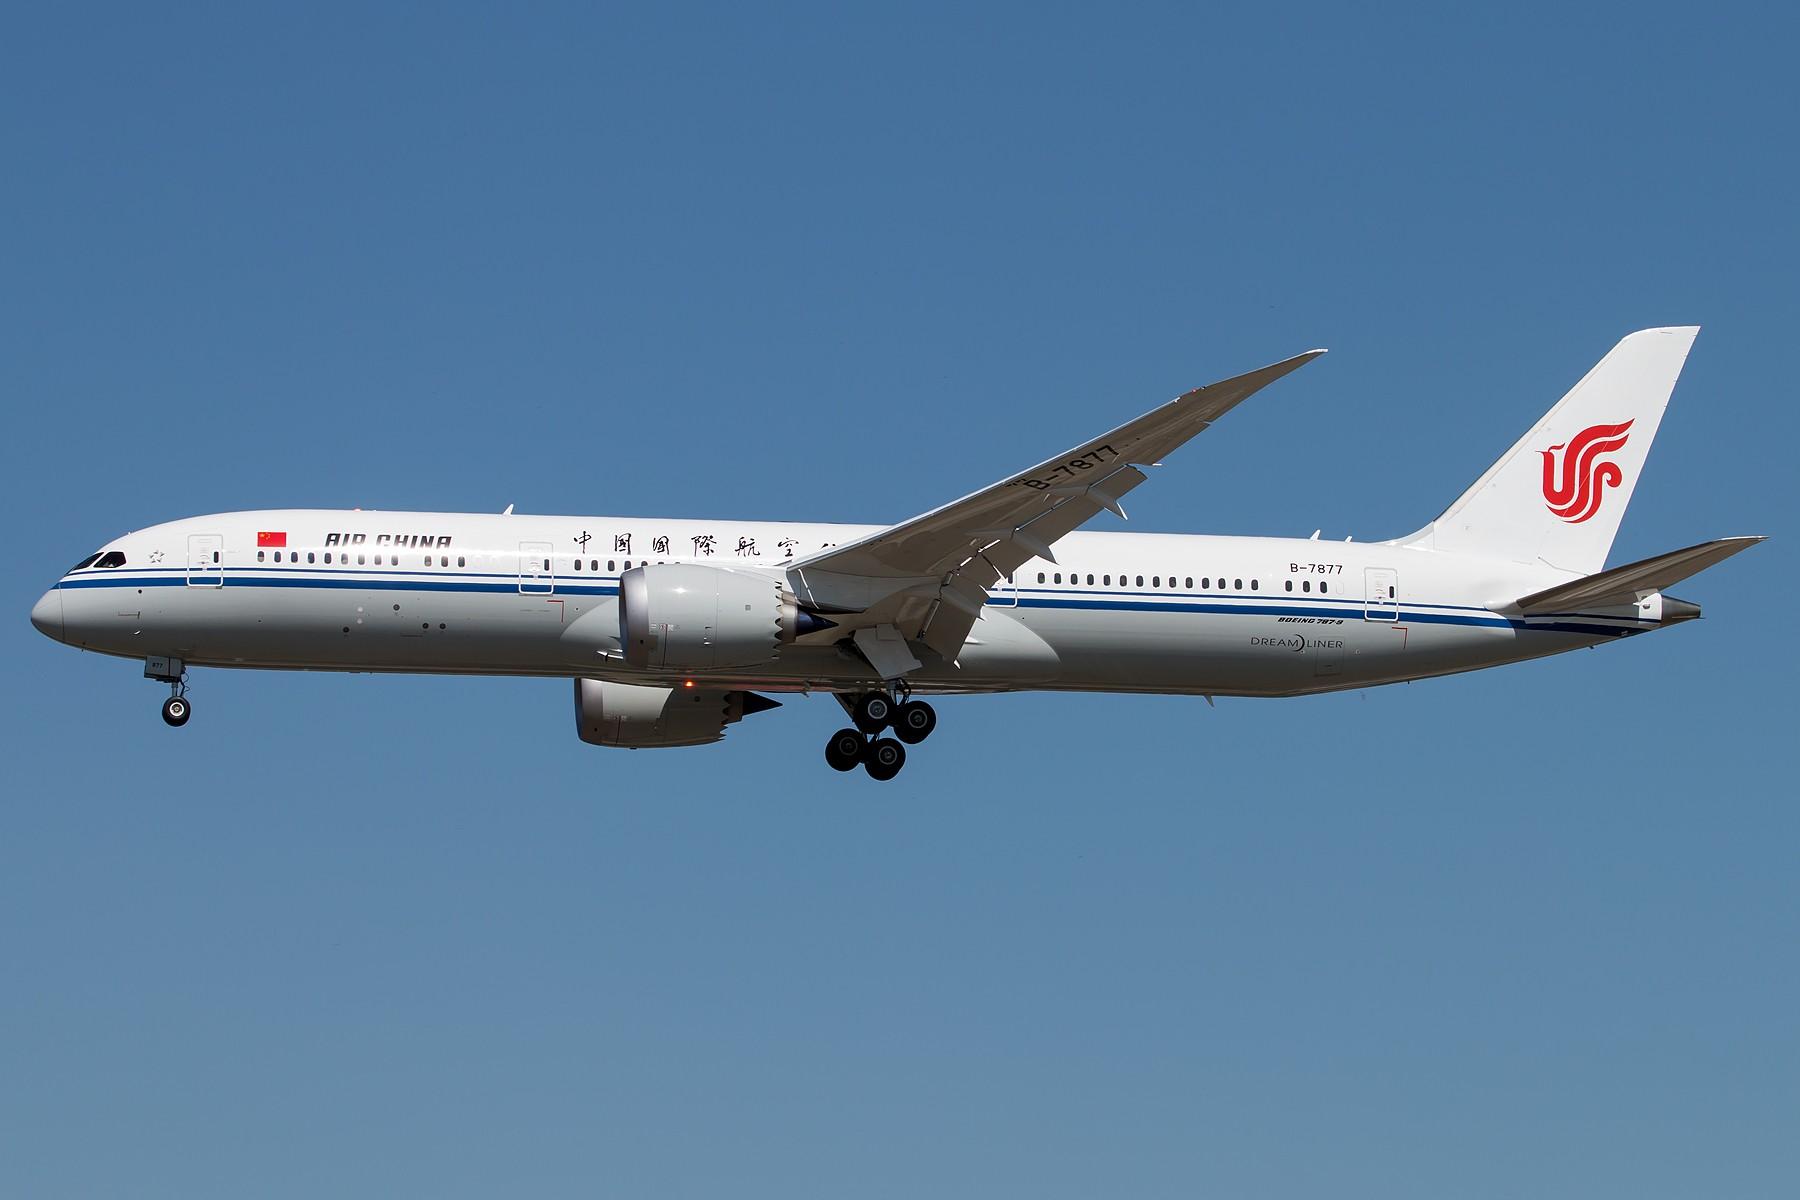 Re:[原创]CA1519&CA1520 1800*1200 BOEING 787-9 B-7877 中国北京首都国际机场